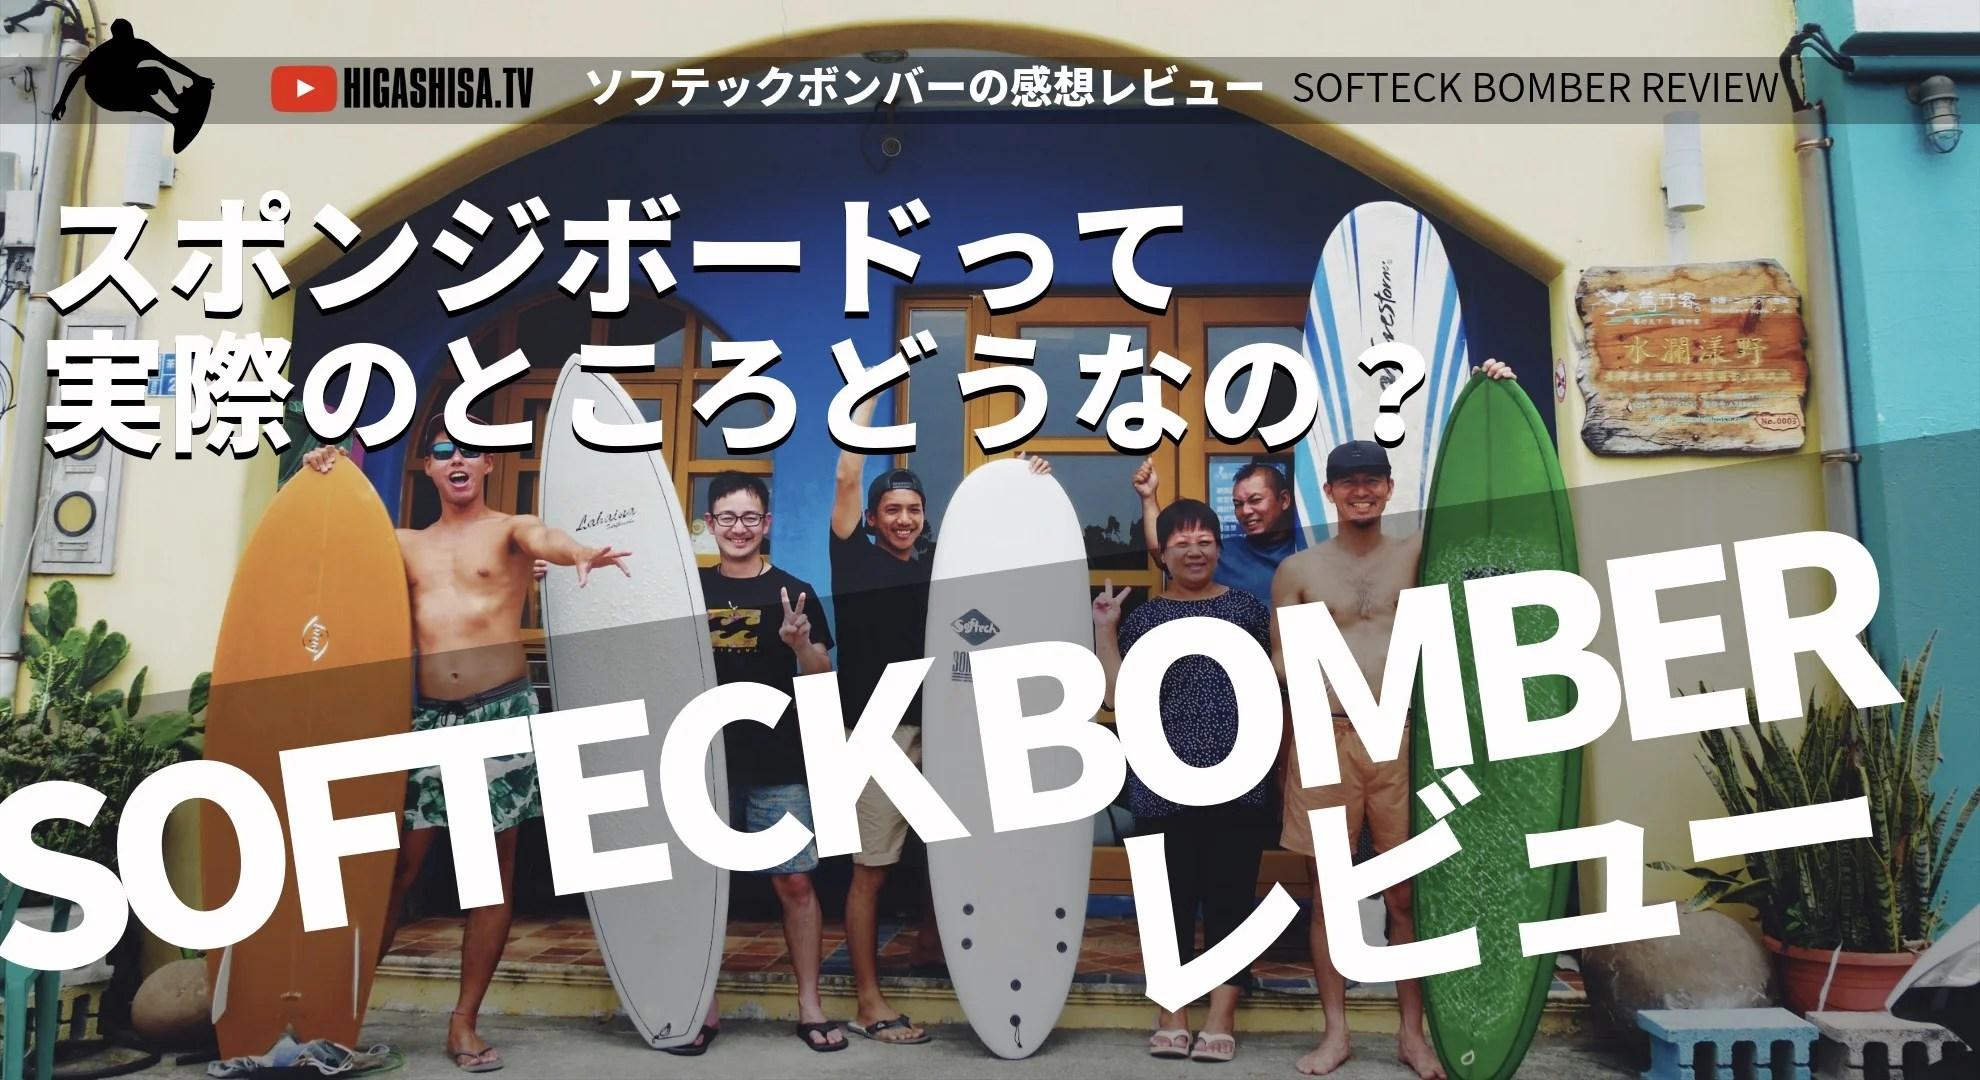 SOFTECK BOMBER